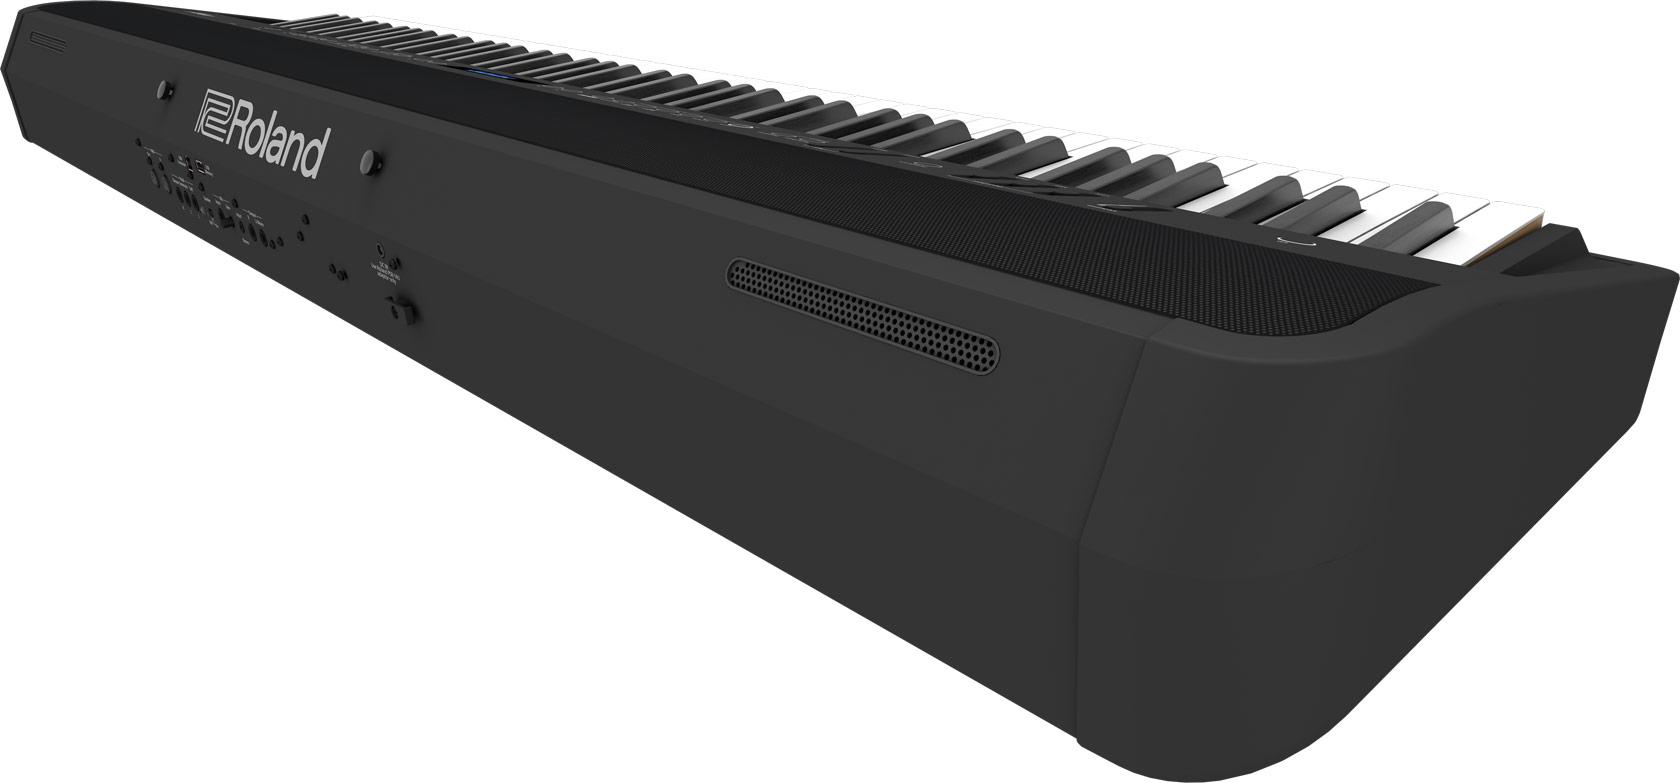 Roland FP-90X-BK